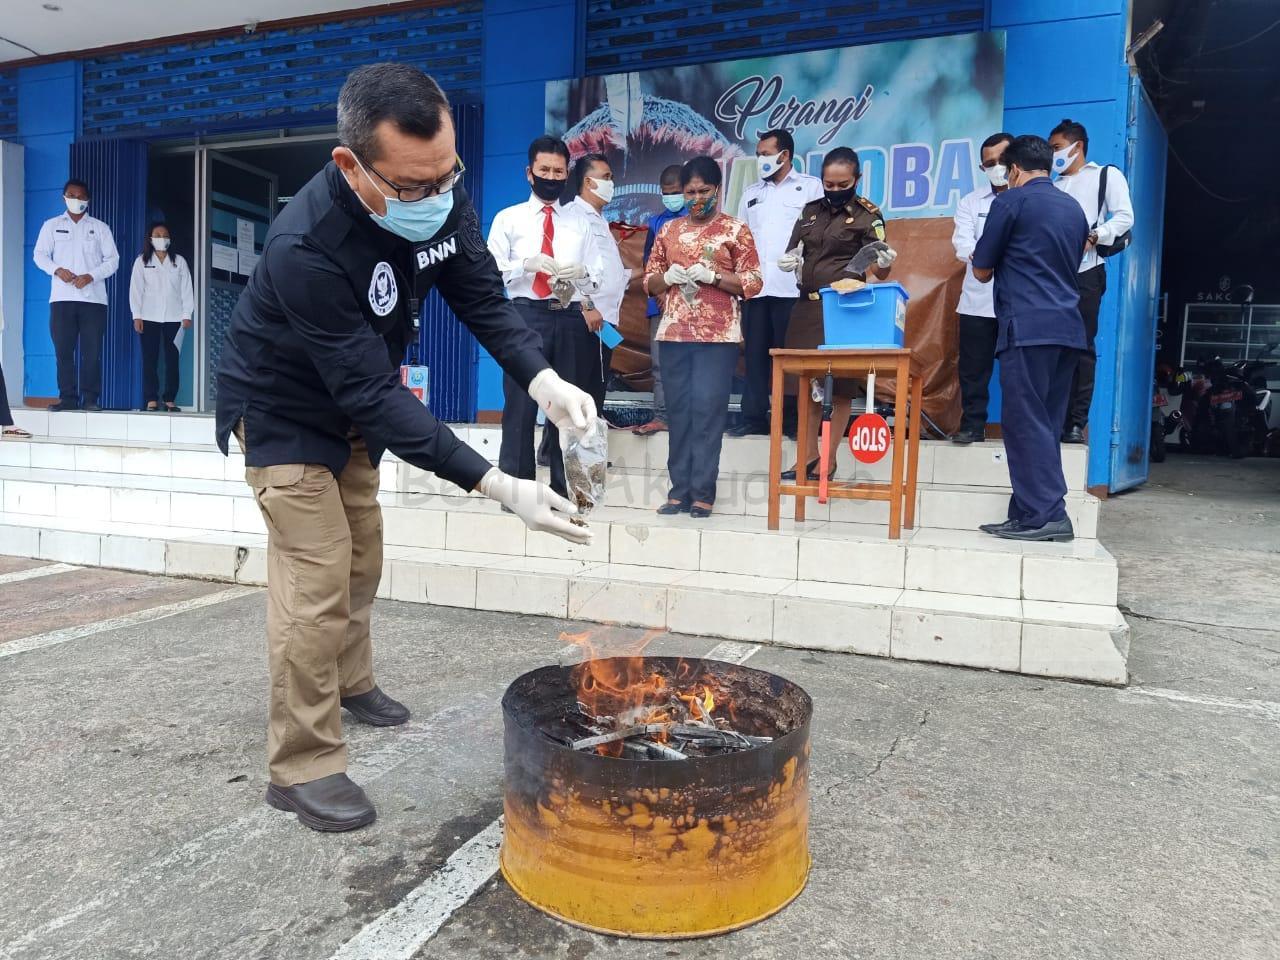 BNN Papua Barat Musnahkan 1.7 Kilogram Ganja 1 IMG 20200907 WA0030